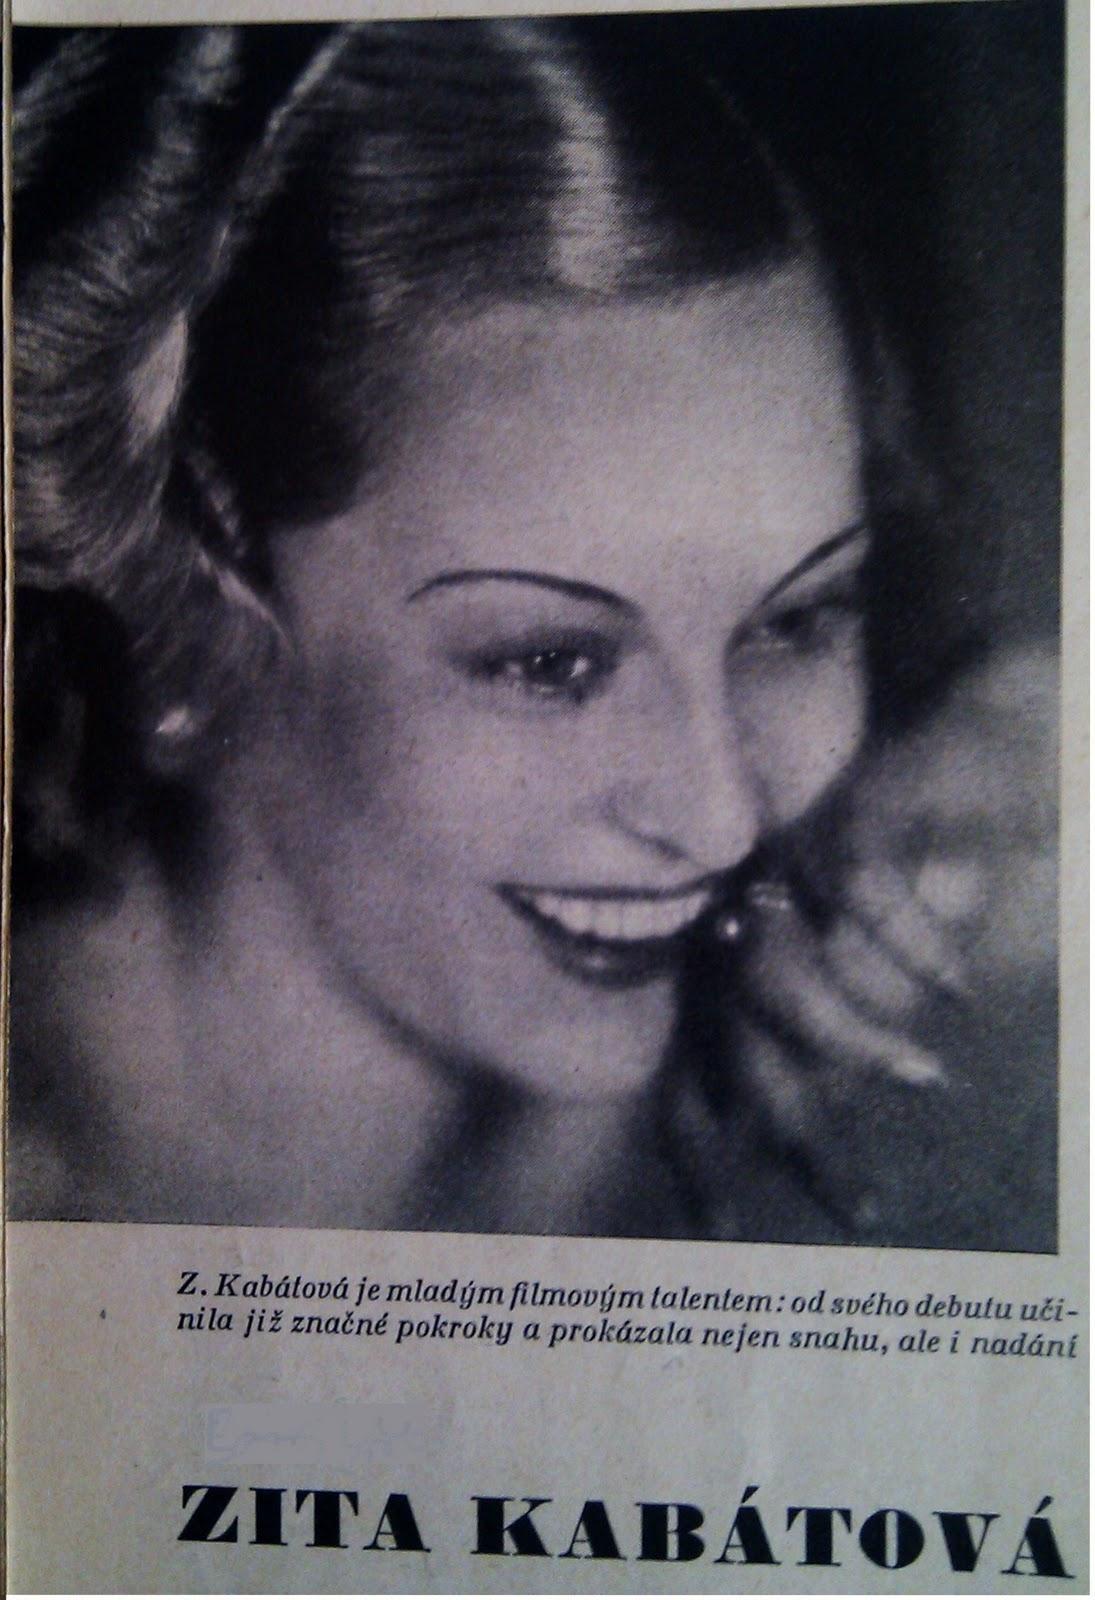 Kirby Bliss Blanton XXX fotos Arlene Banas,Meghan, Duchess of Sussex